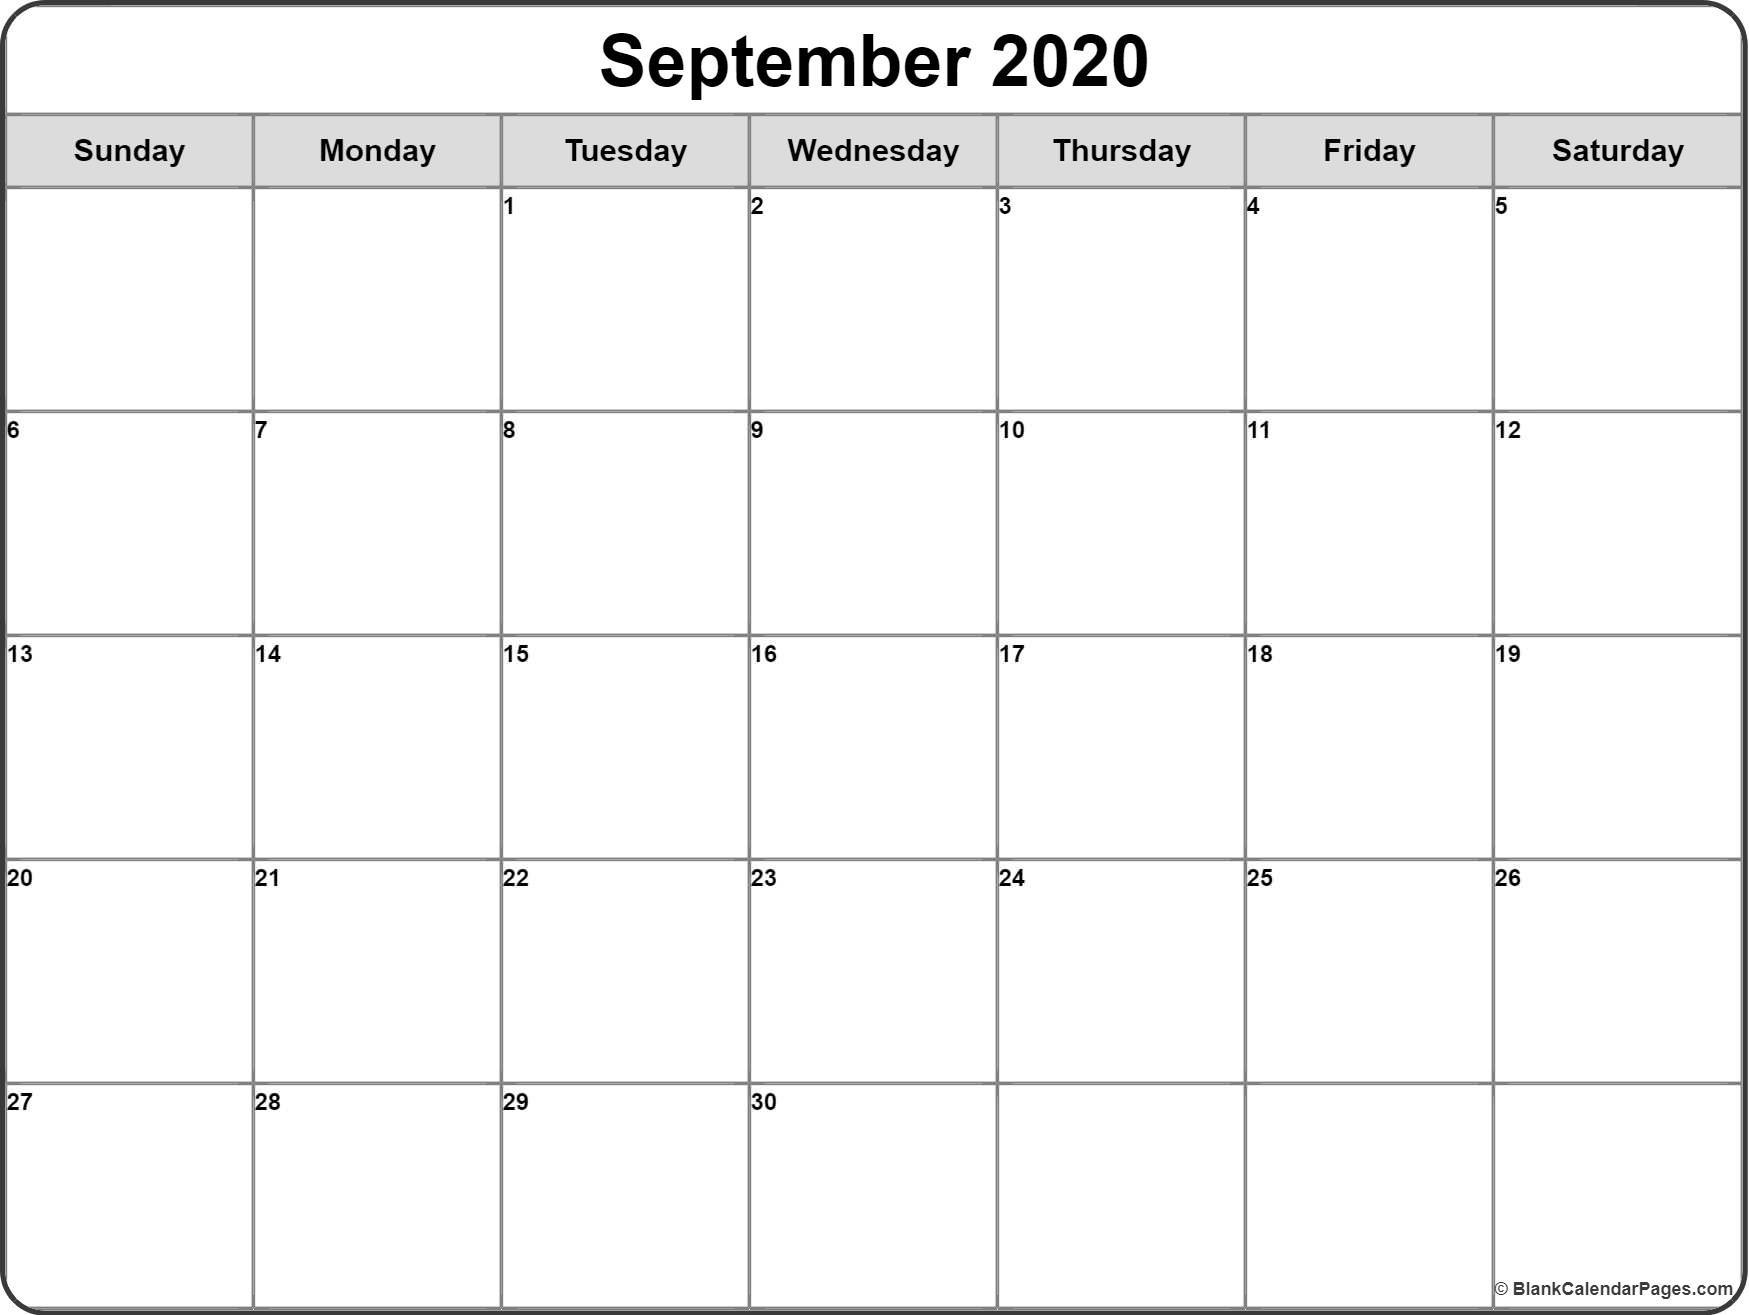 September 2020 Calendar | Free Printable Monthly Calendars  Free Printable Calendars 2020 Monthly